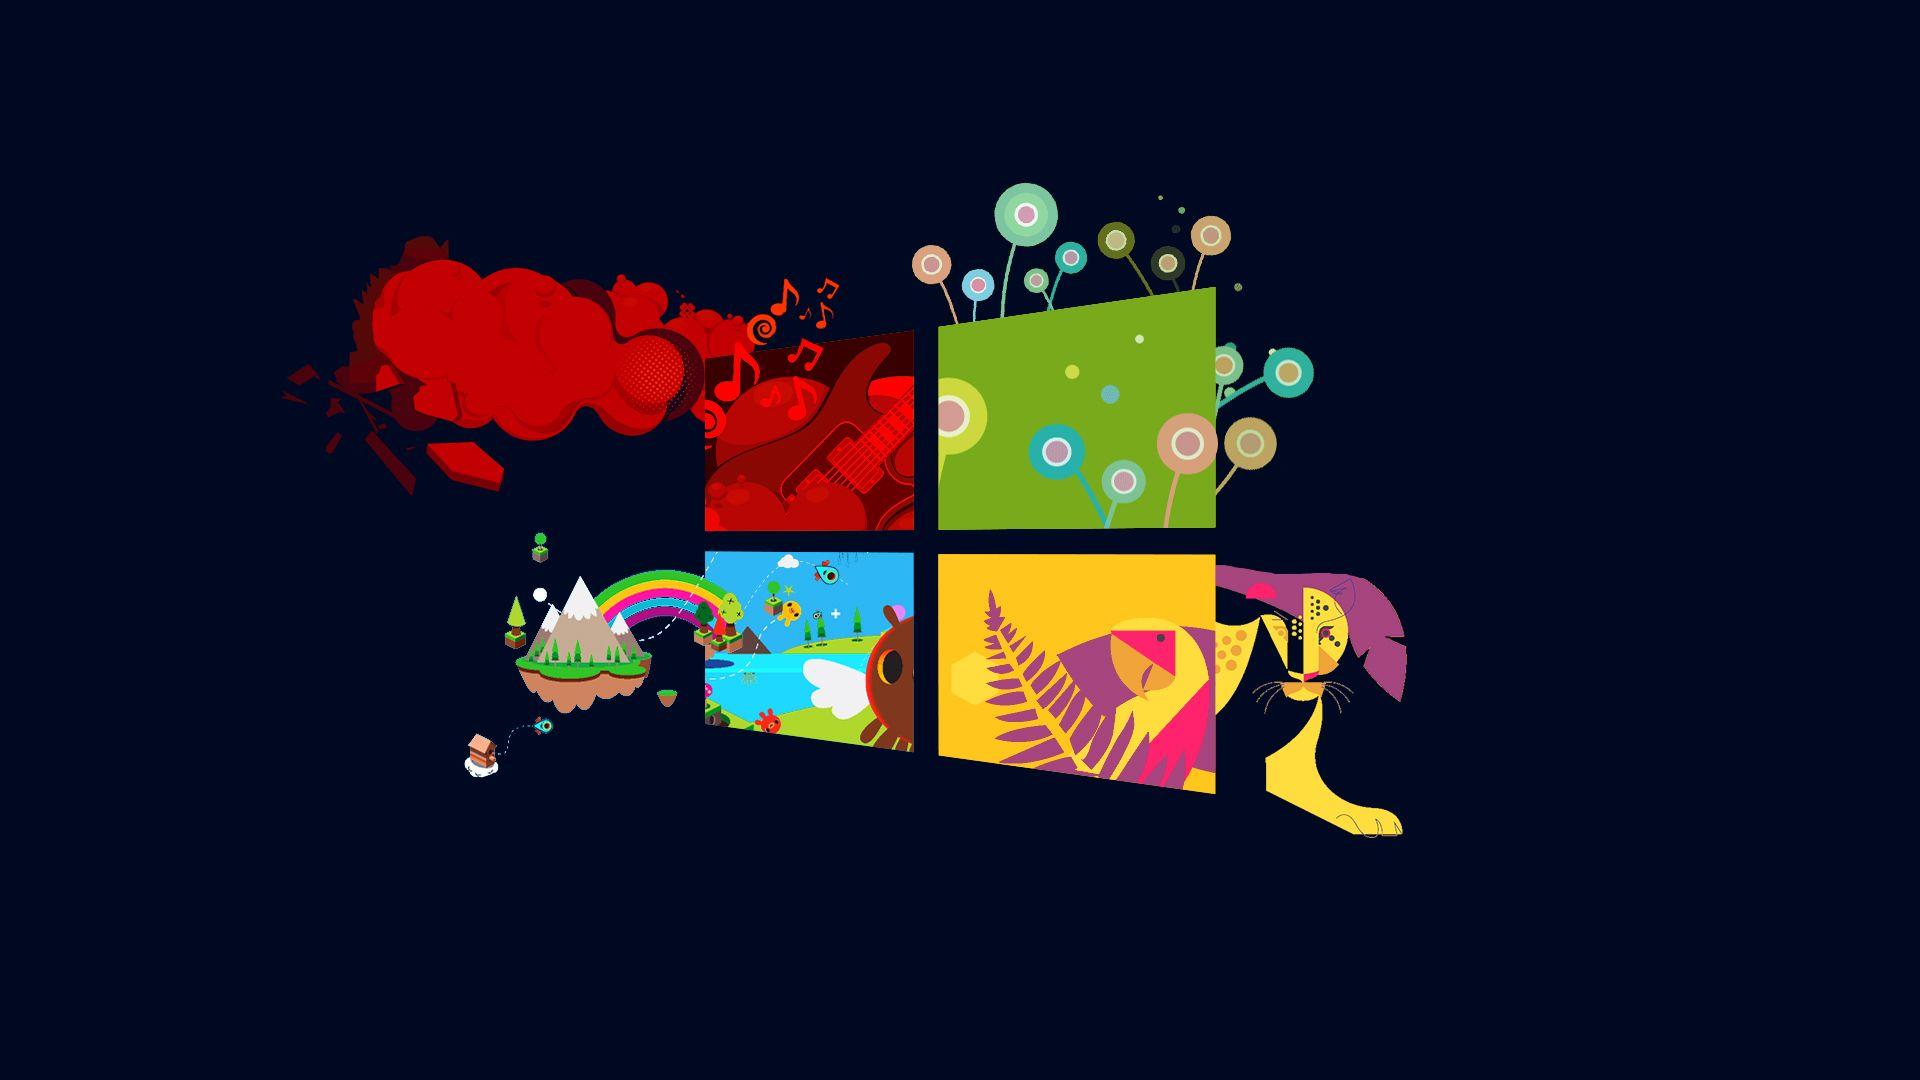 Windows Wallpack 8 By Metroui Deviantart Com On Deviantart Windows Wallpaper Free Desktop Wallpaper Wallpaper Pc